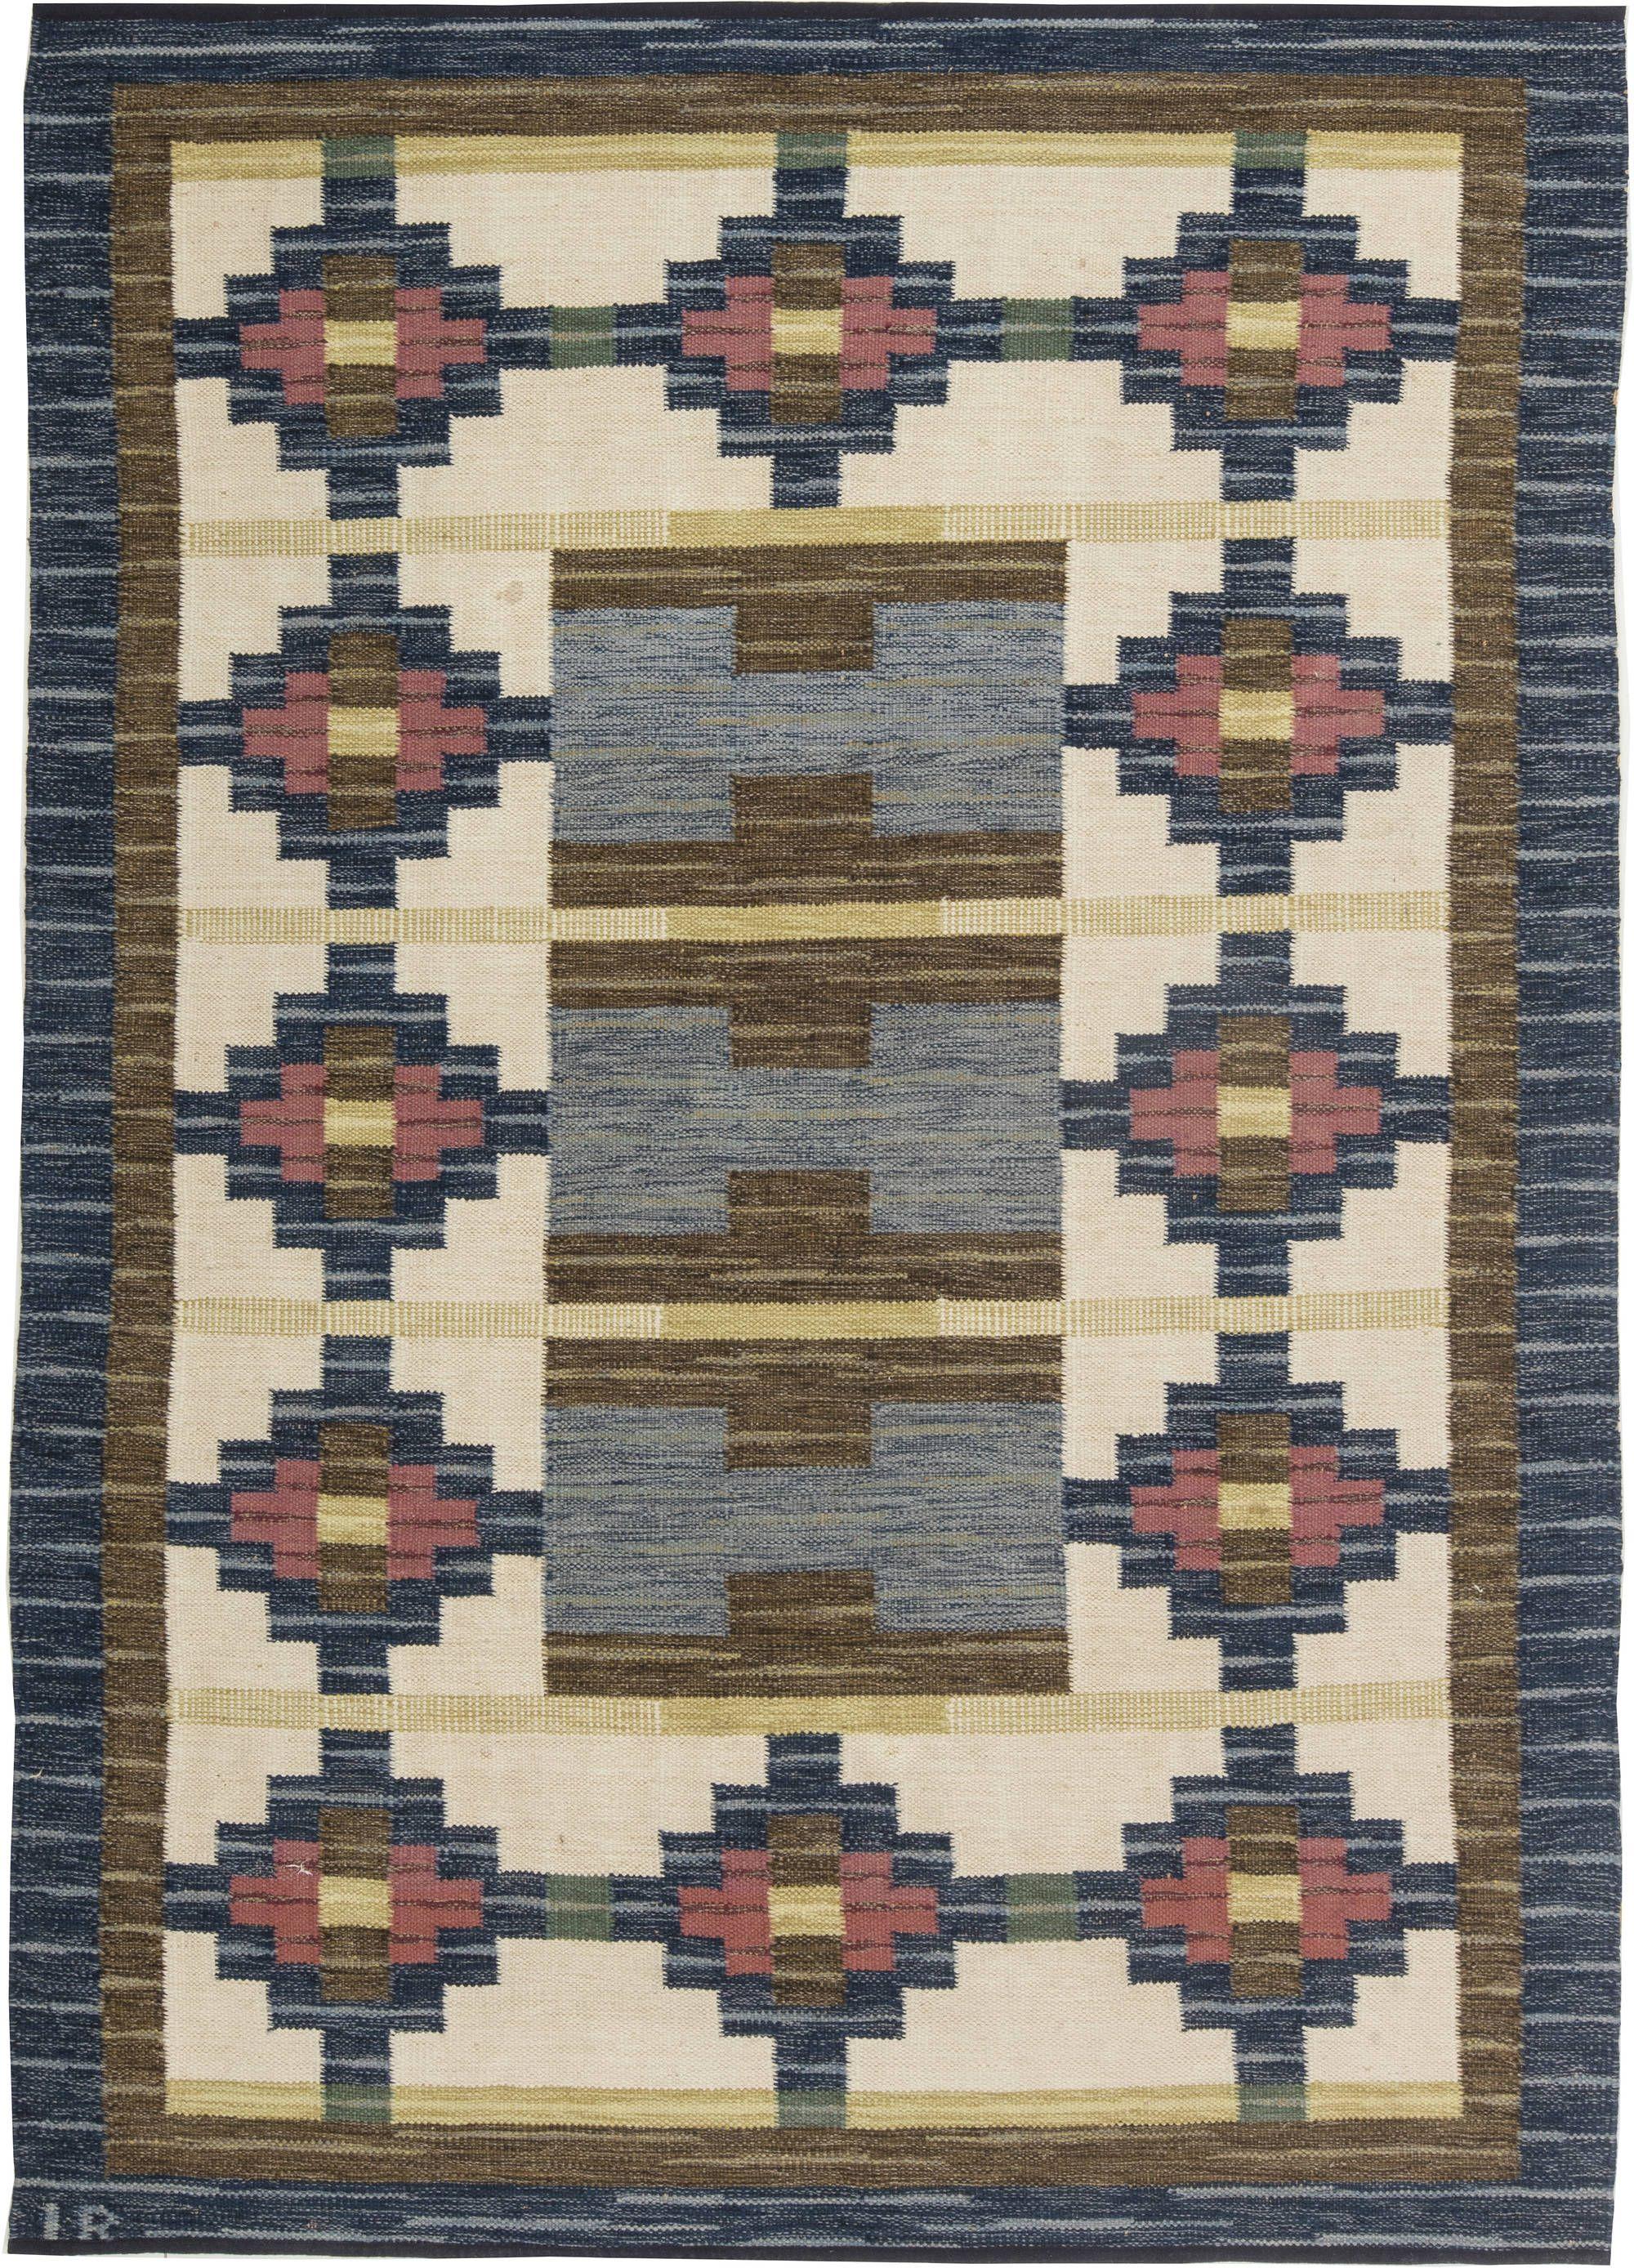 Swedish Flat Weave Rug By Ir Bb6312 By Dlb Flat Weave Carpet Boho Rug Flat Weave Rug